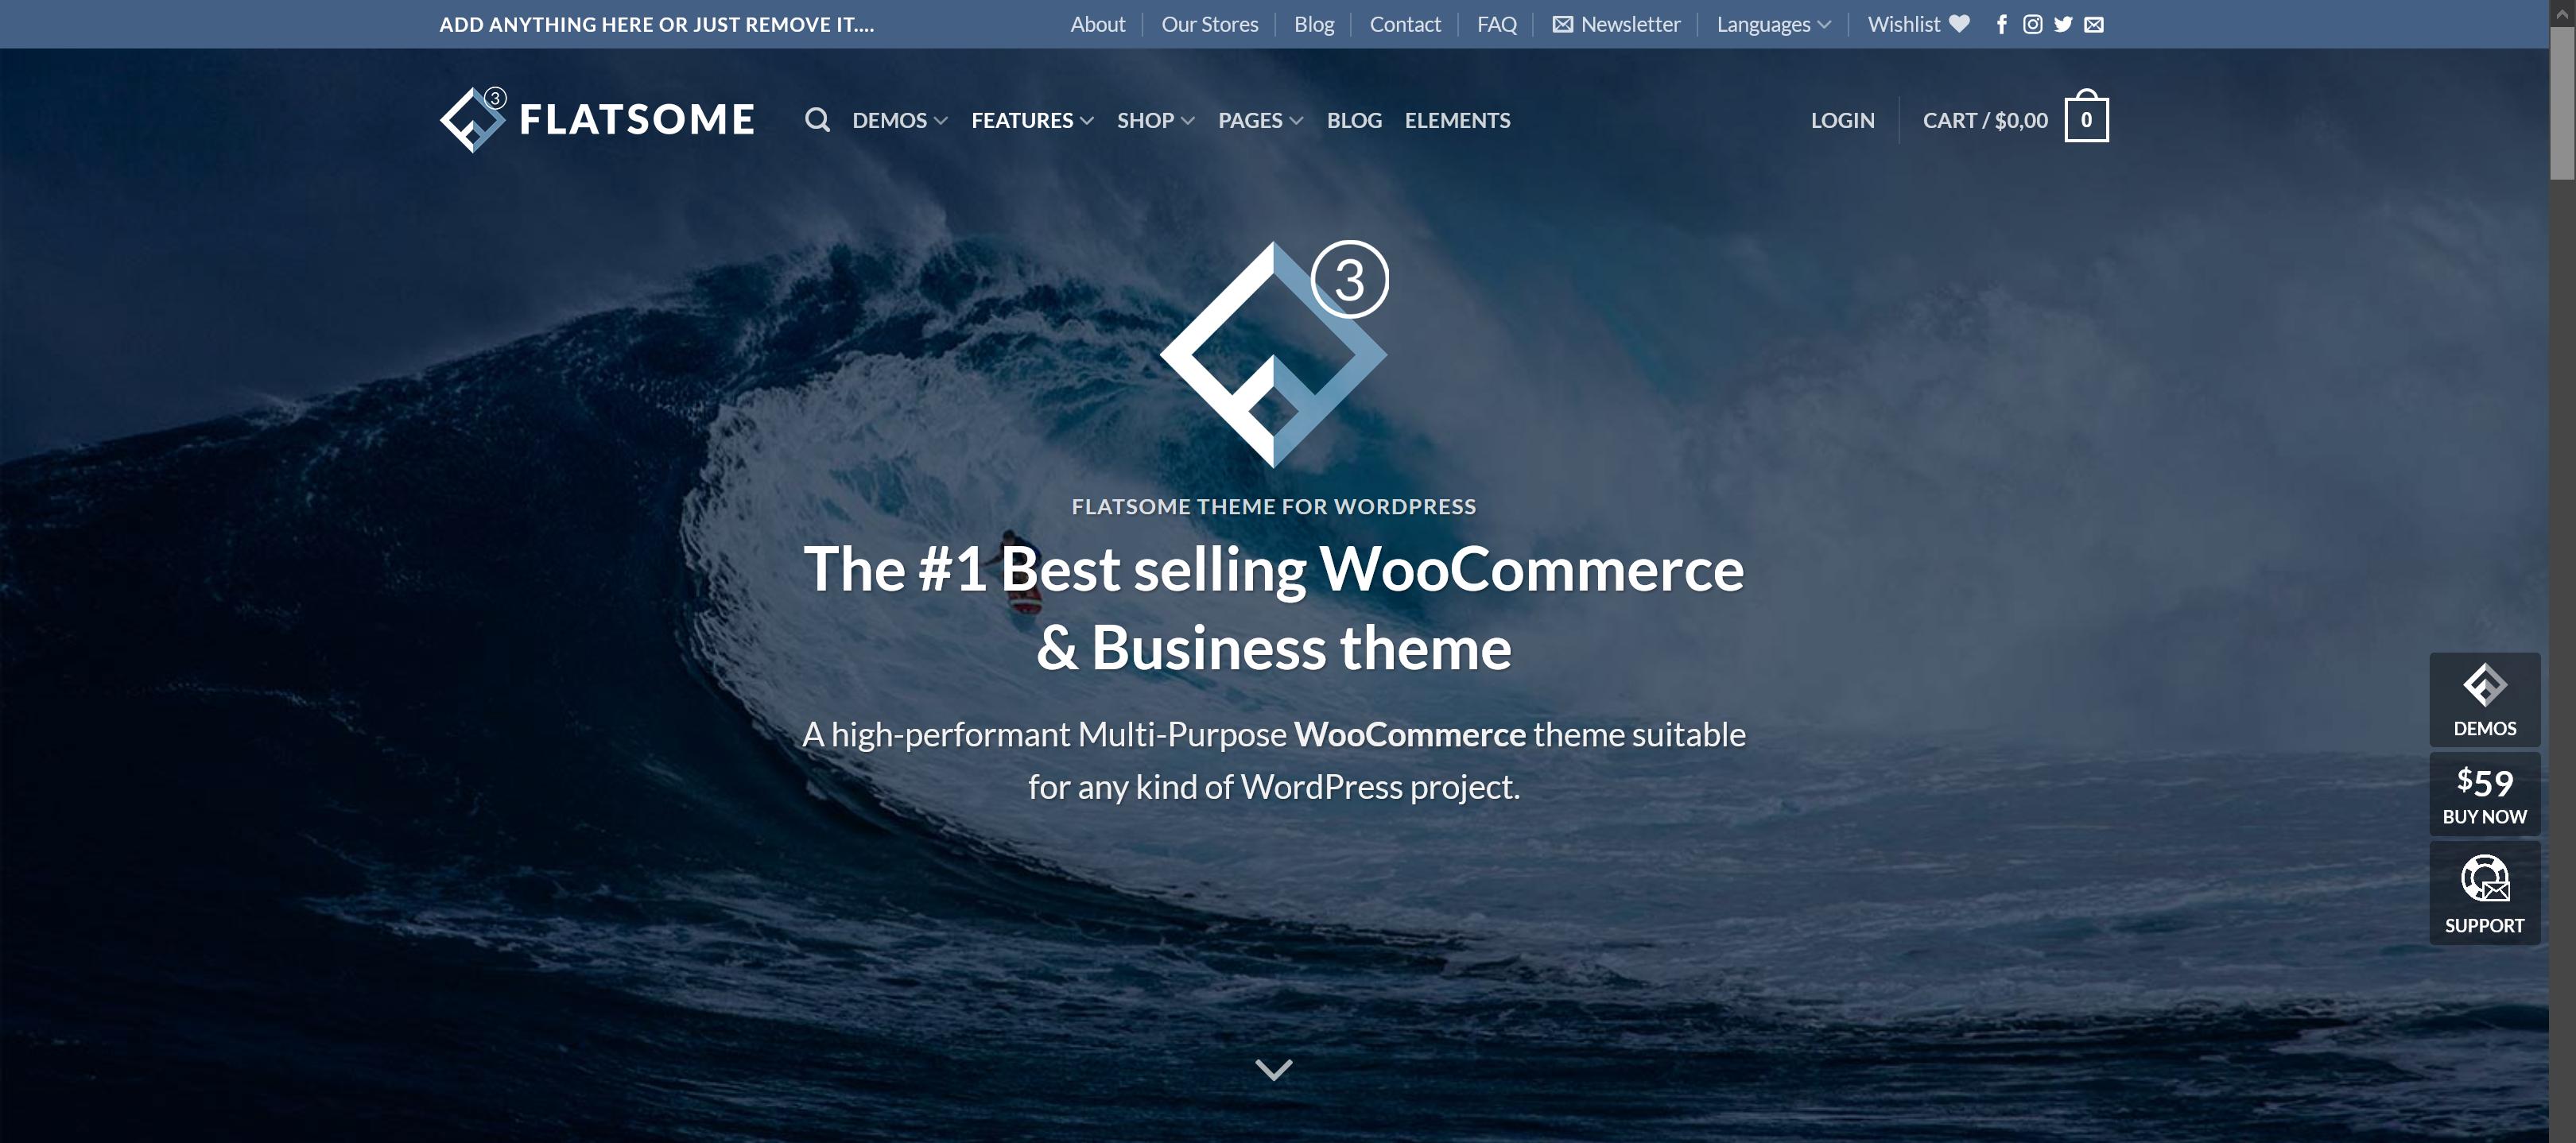 Flatsome 3.14.2 – MultiPurpose WooCommerce Theme